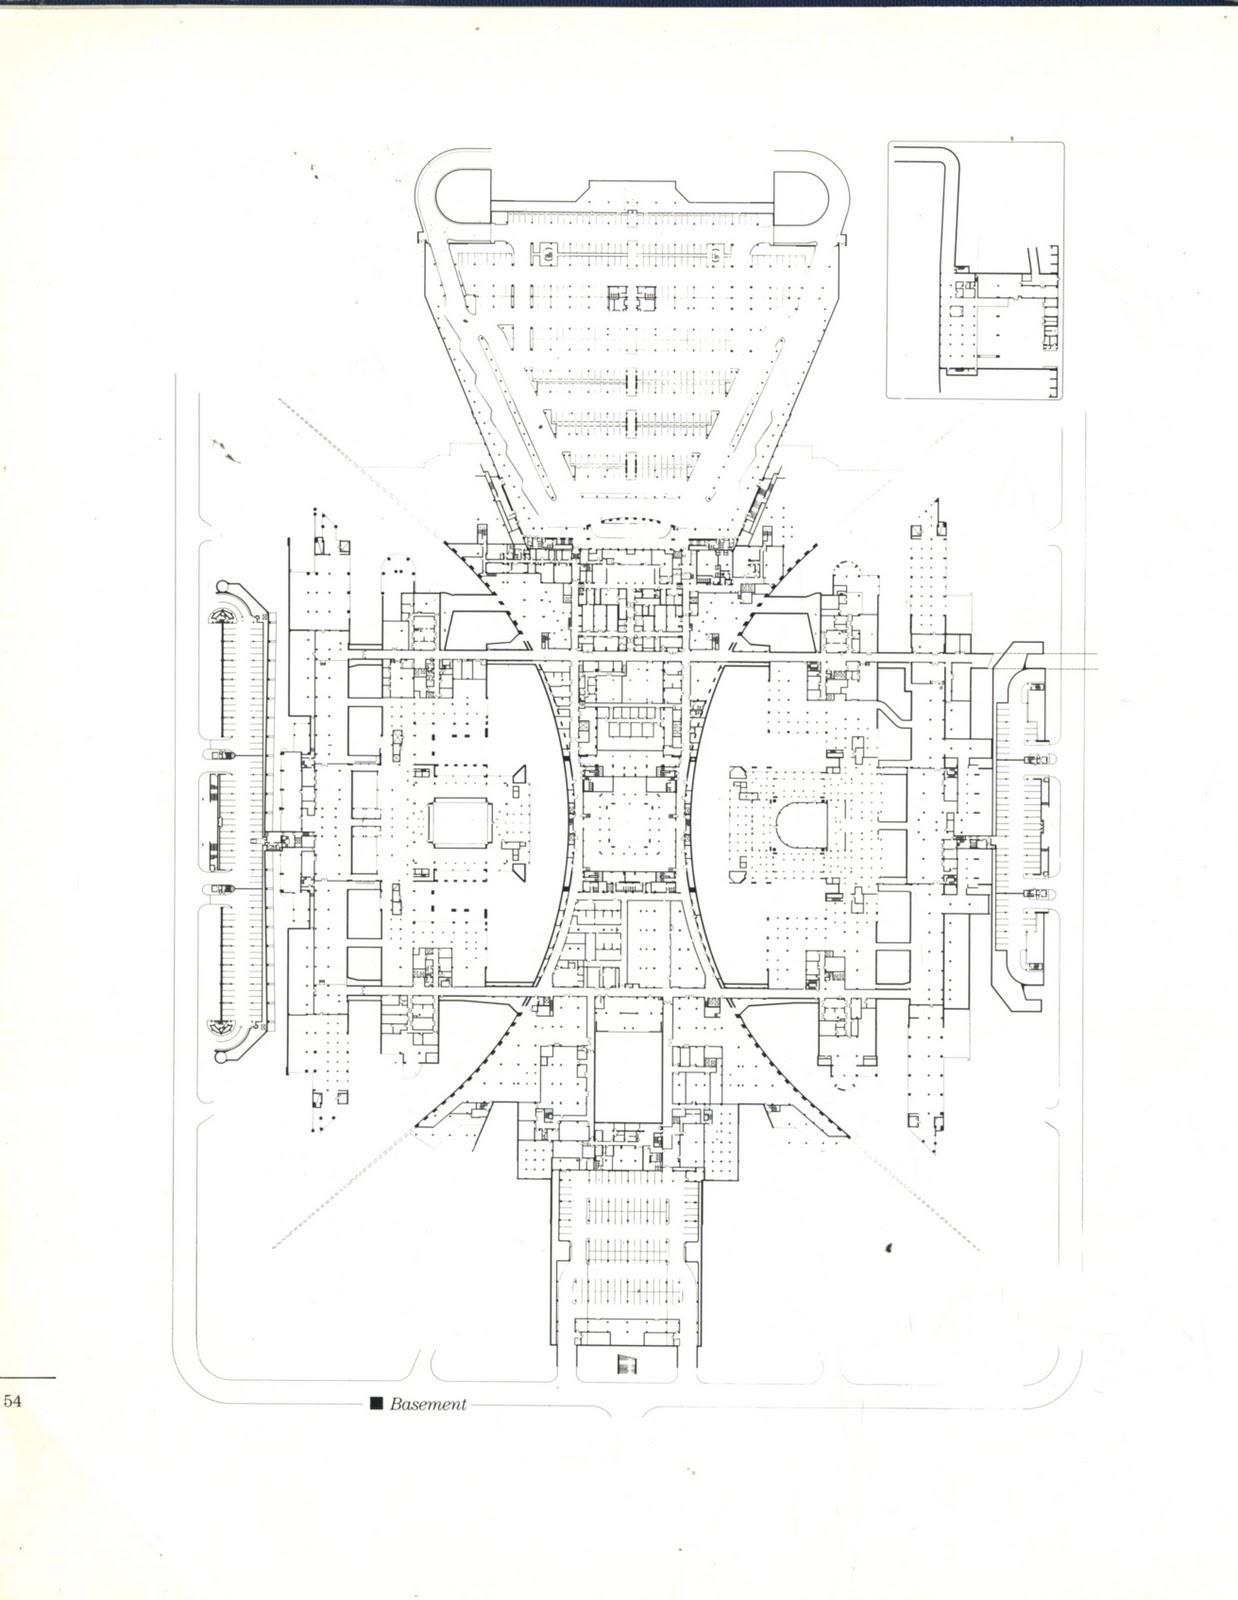 architectural design 8 parliament house plans amp sections